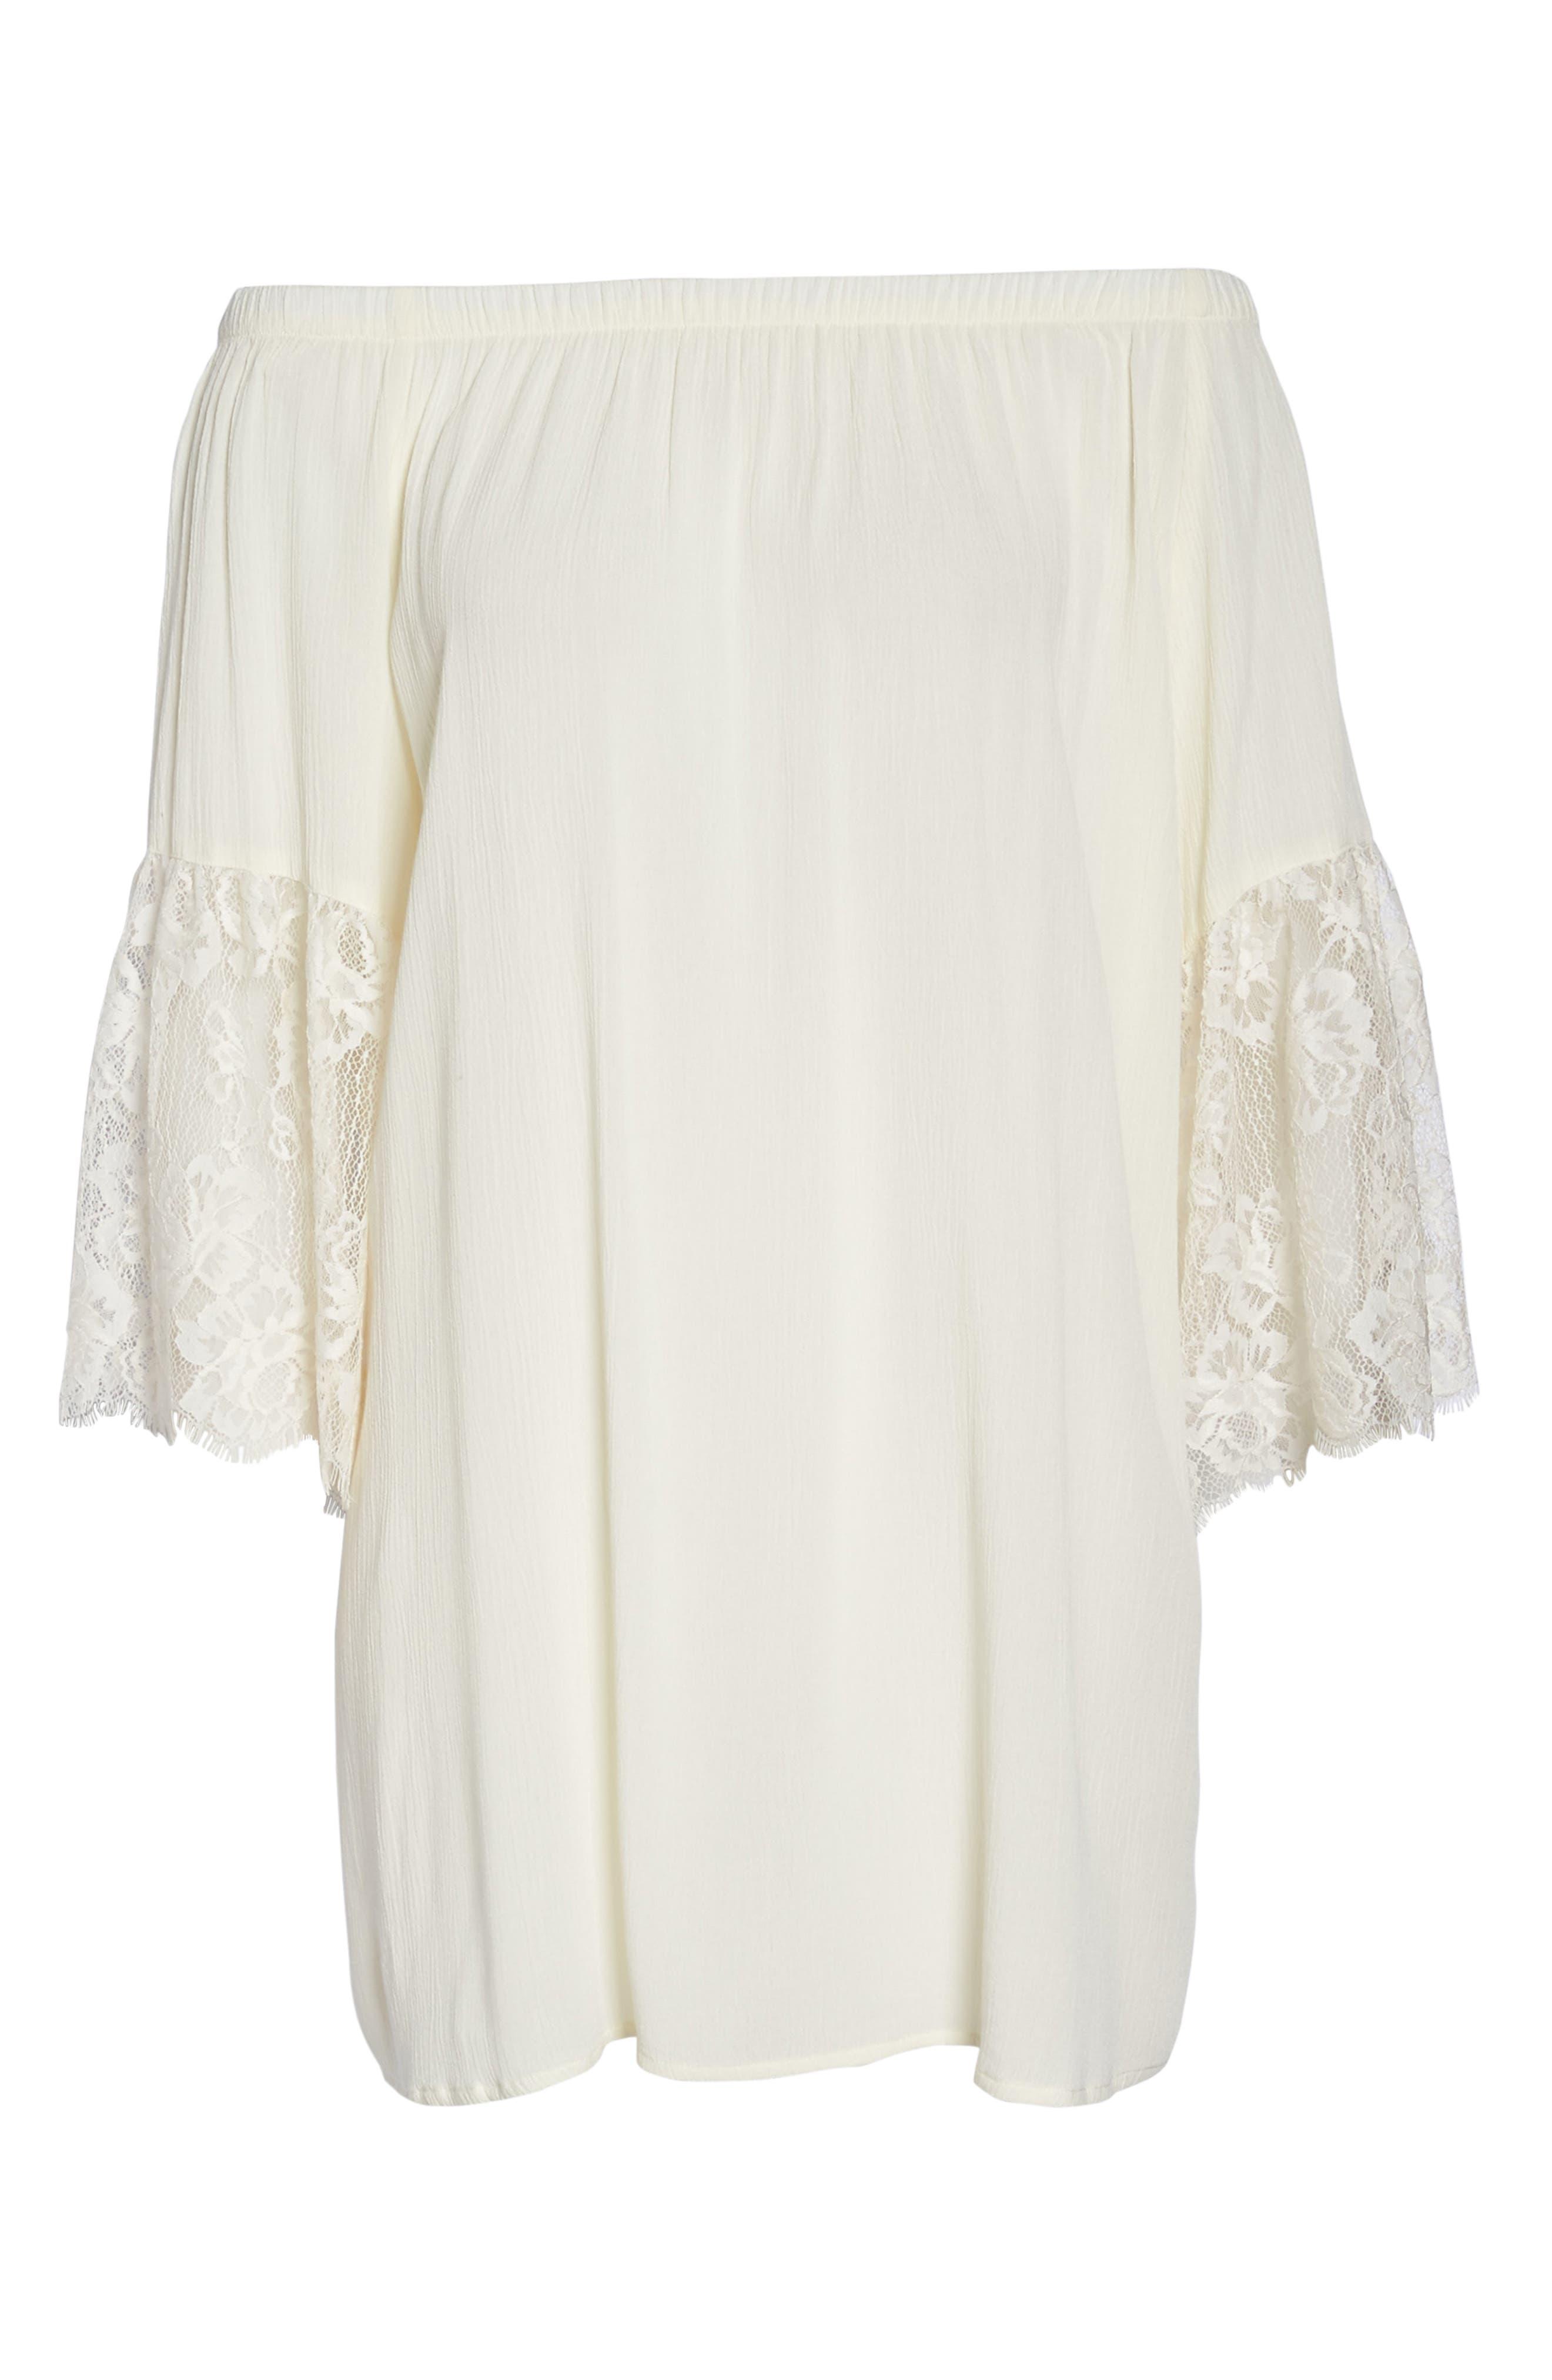 Off the Shoulder Cover-Up Dress,                             Alternate thumbnail 16, color,